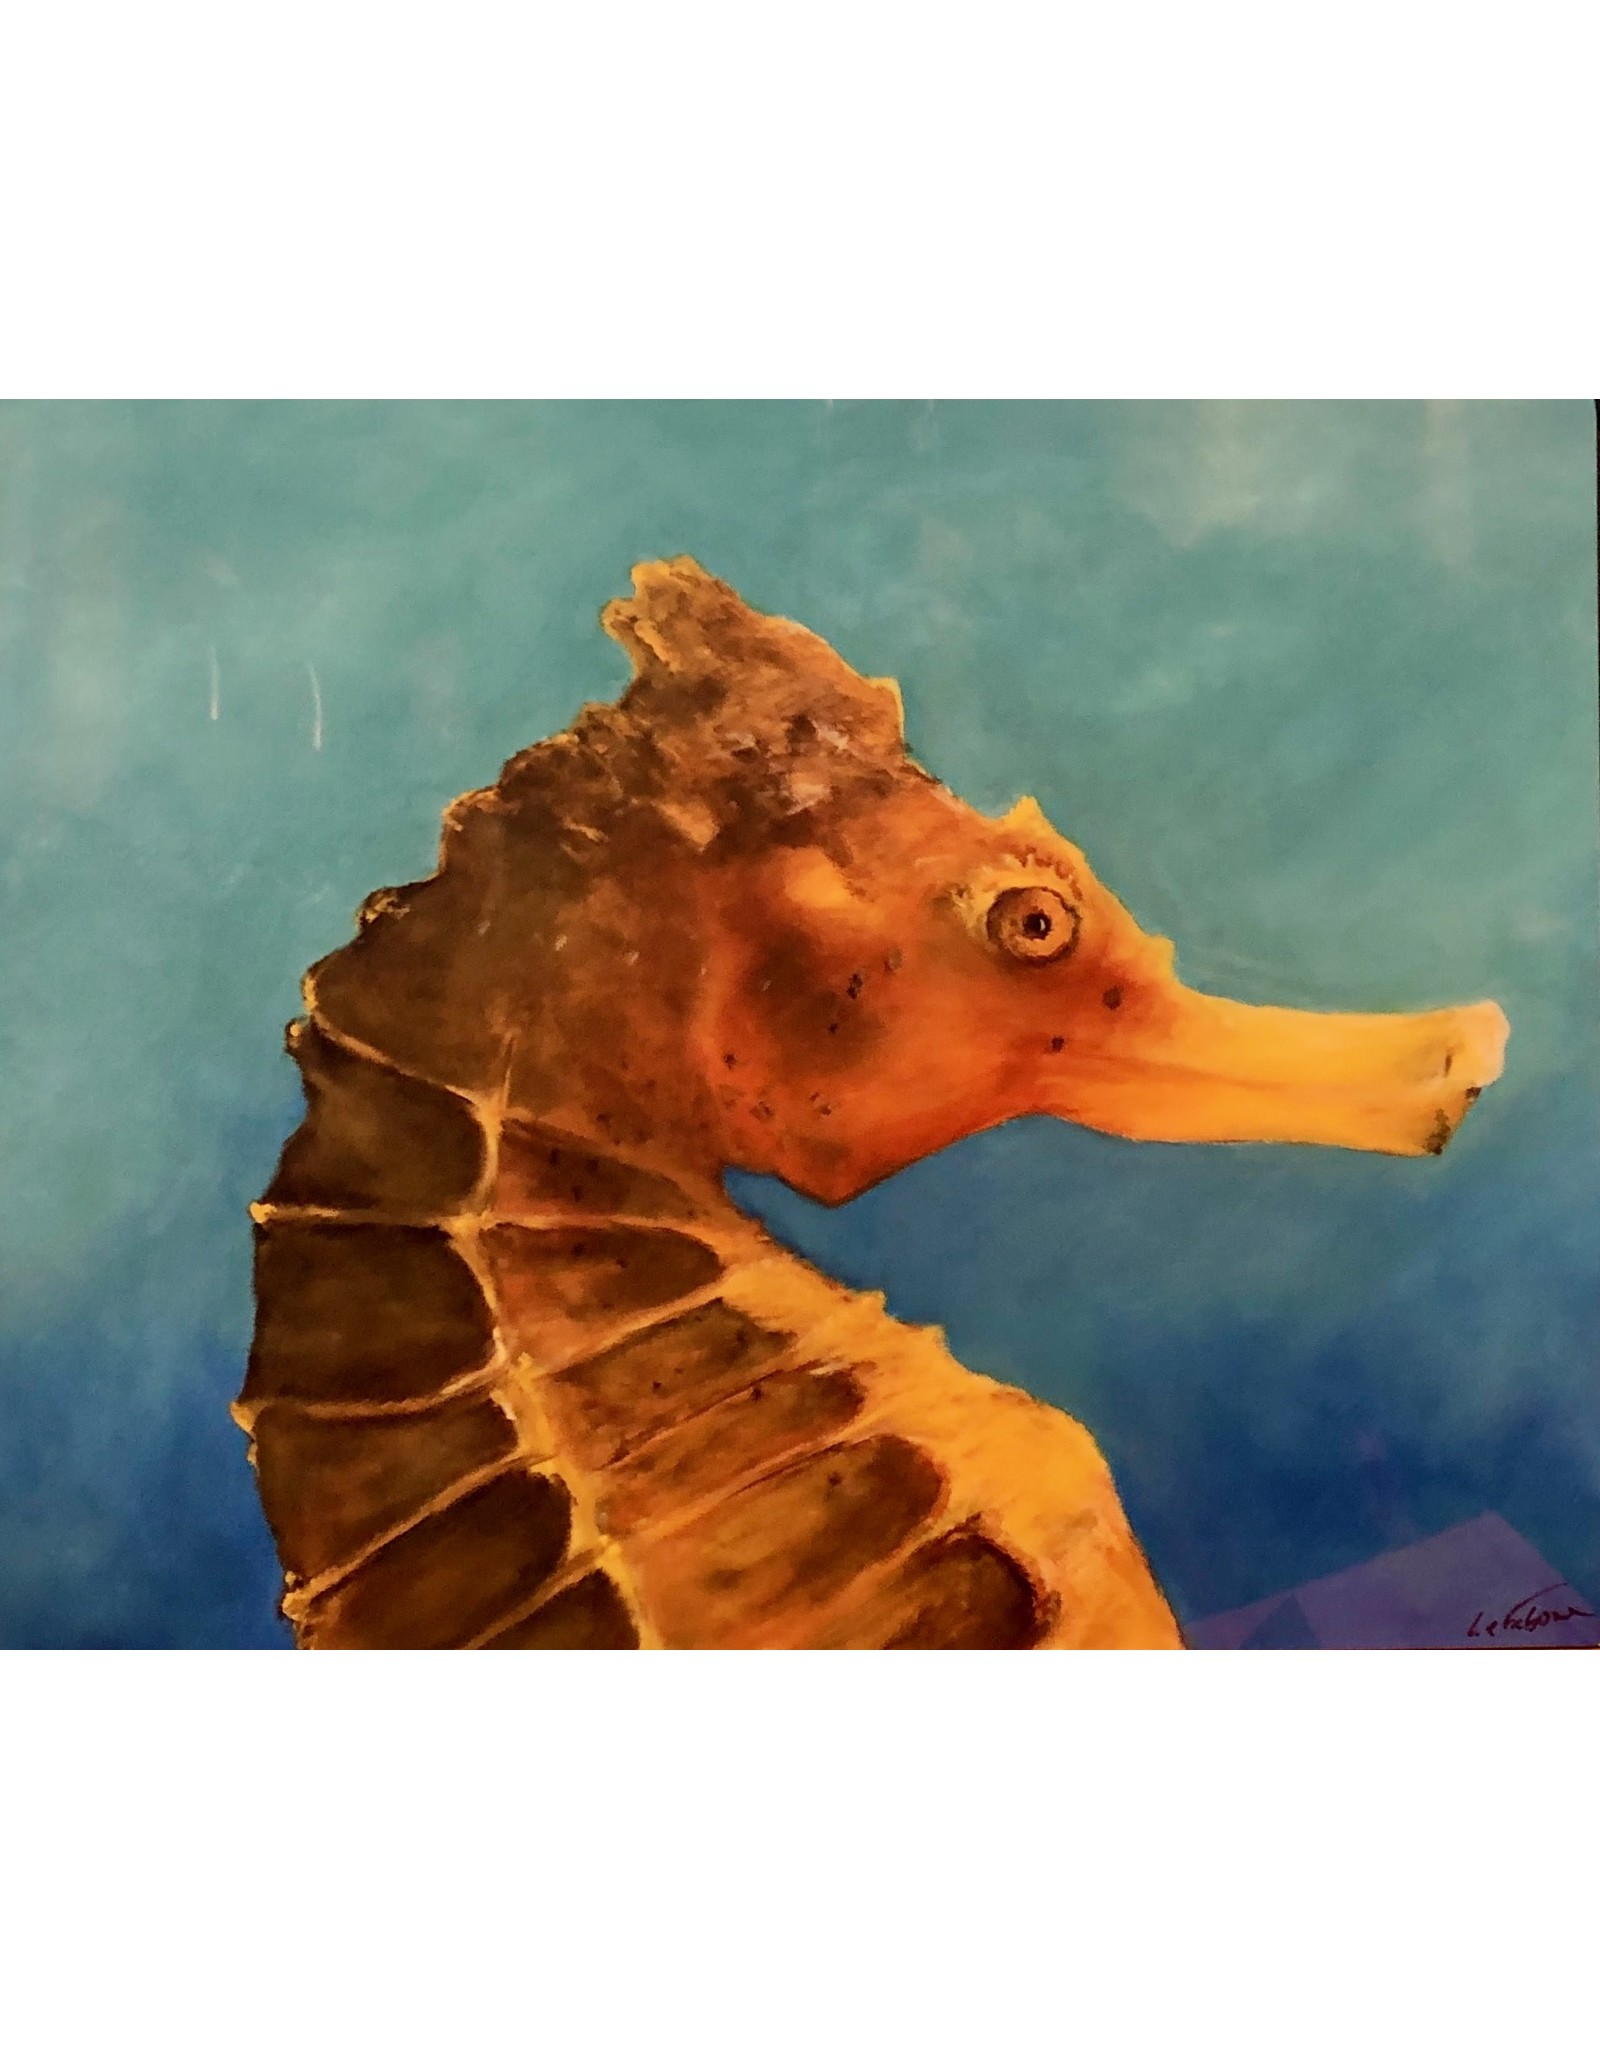 "Guy LeFebvre Portrait of a Seahorse (giclee on metal 8x10"" GUYL)"